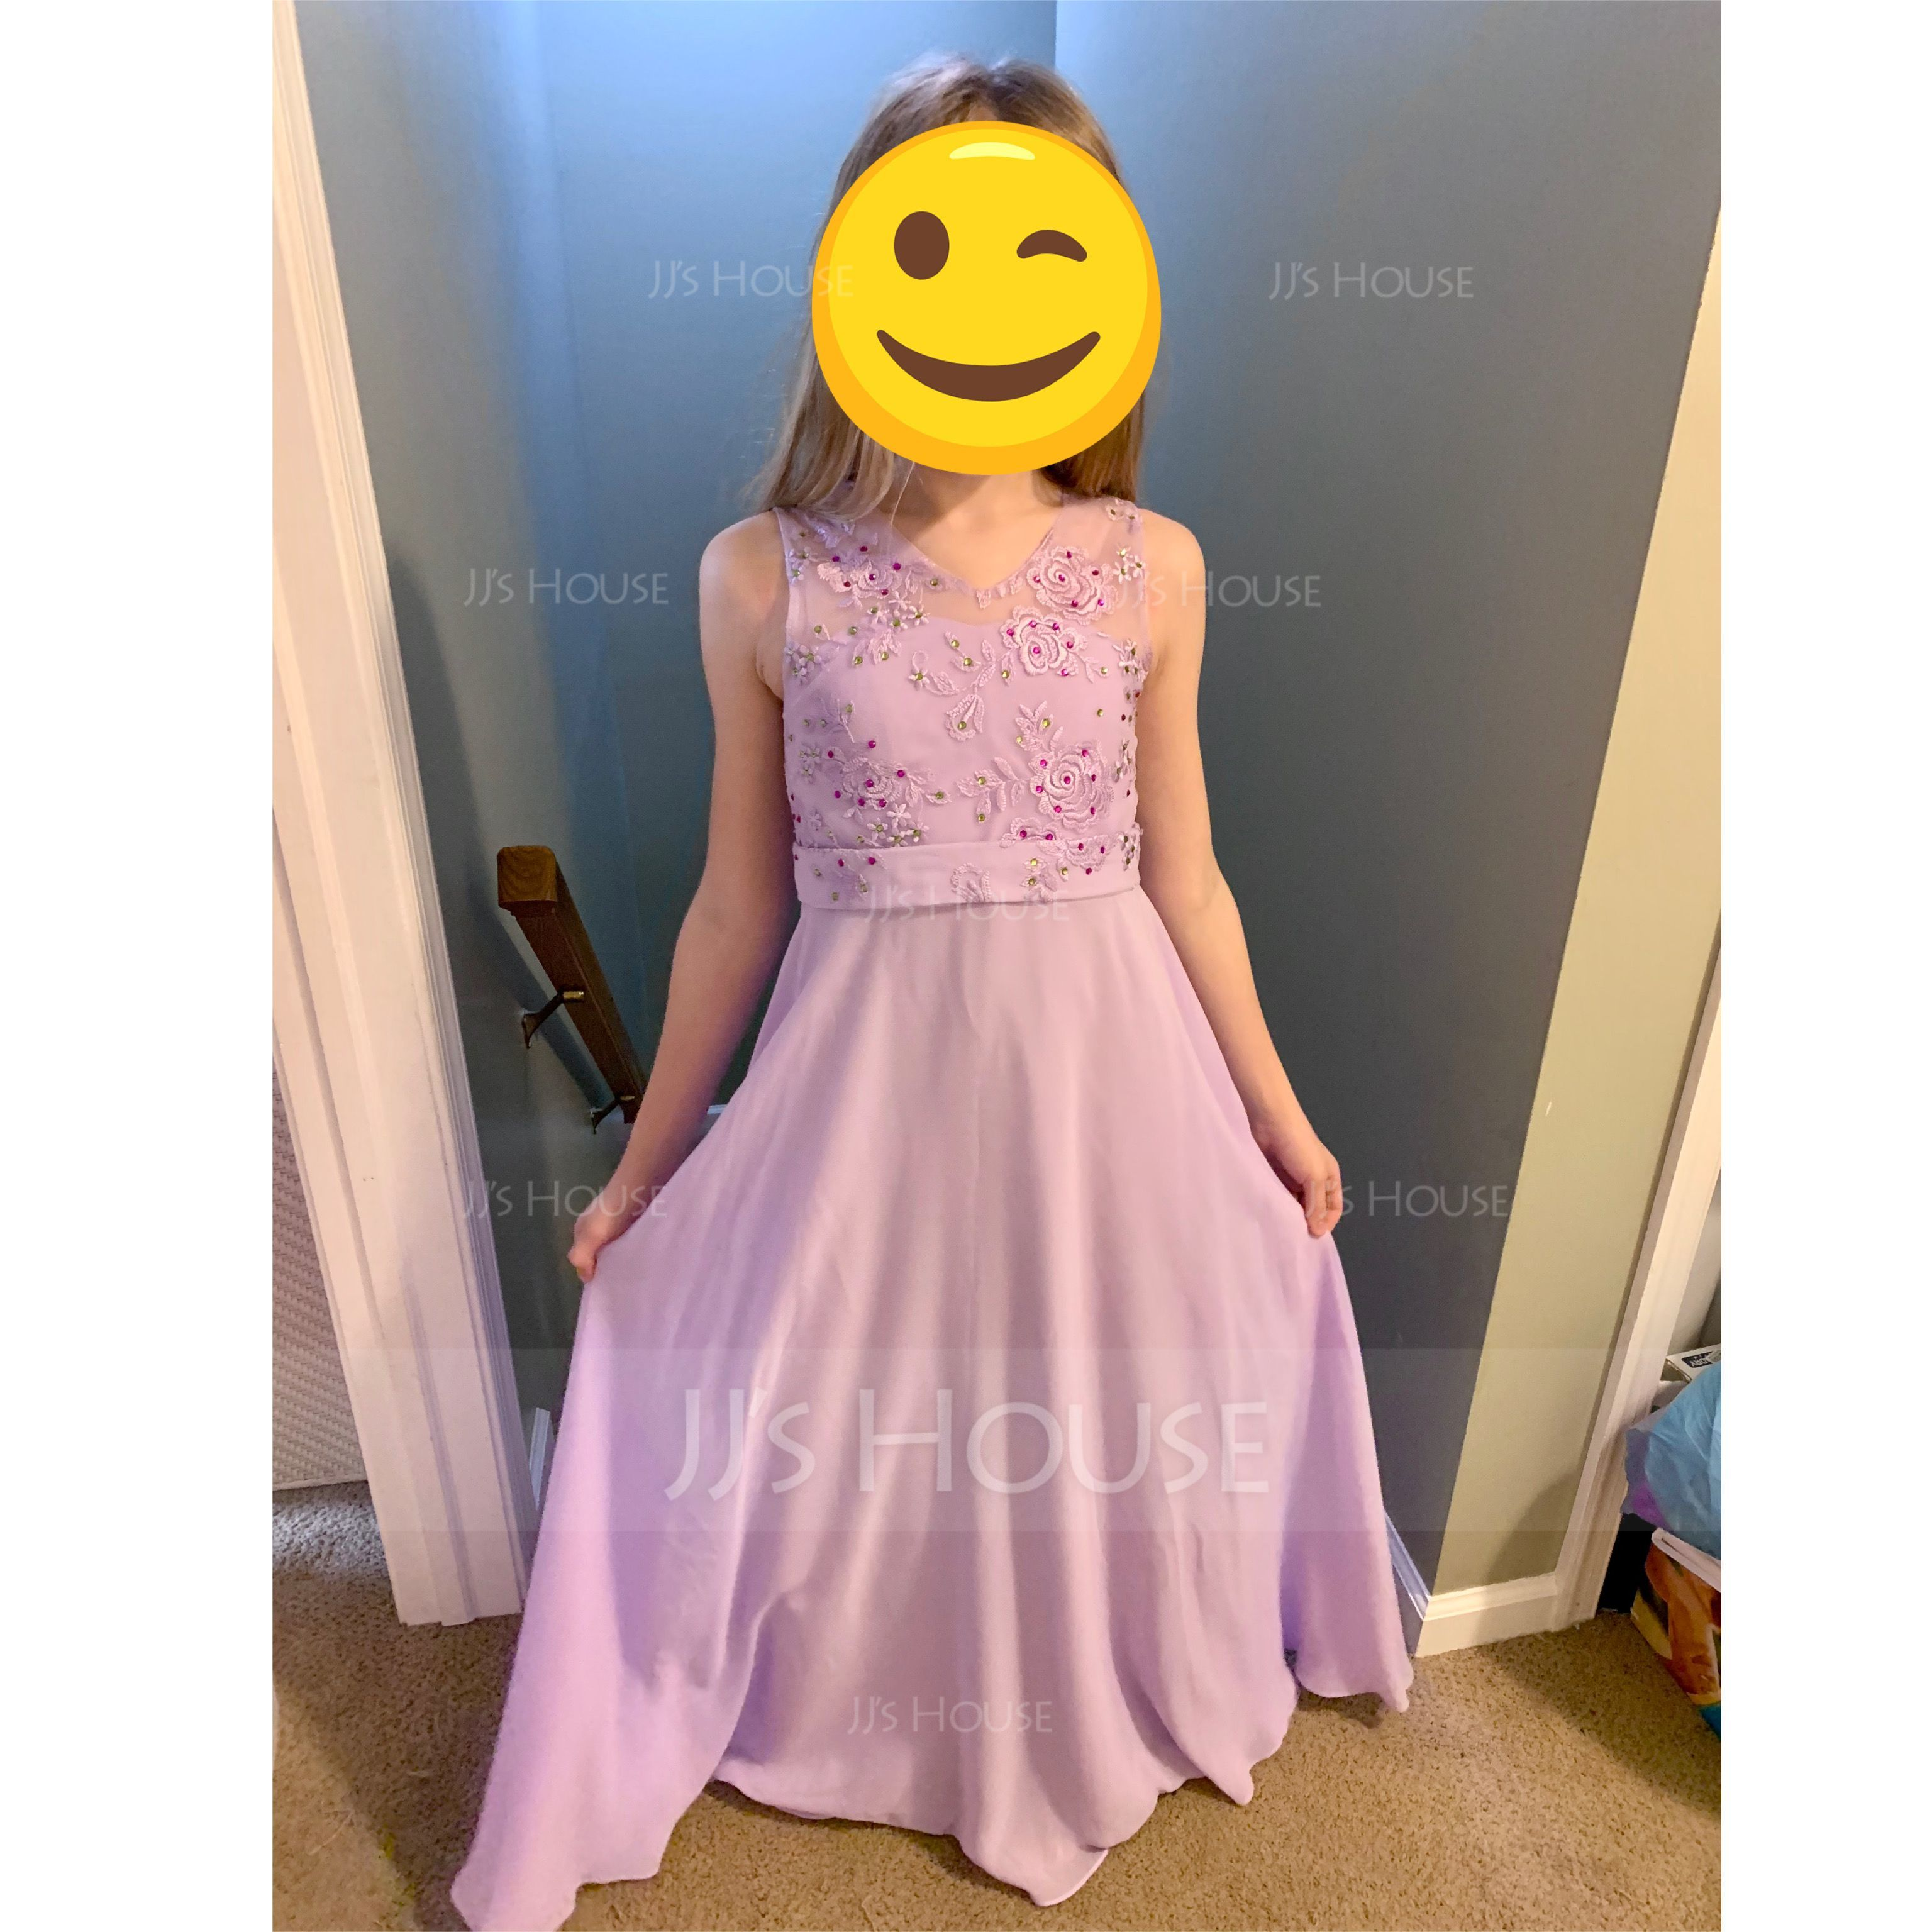 A-Line/Princess Scoop Neck Floor-Length Chiffon Junior Bridesmaid Dress With Beading Sequins (009119585)